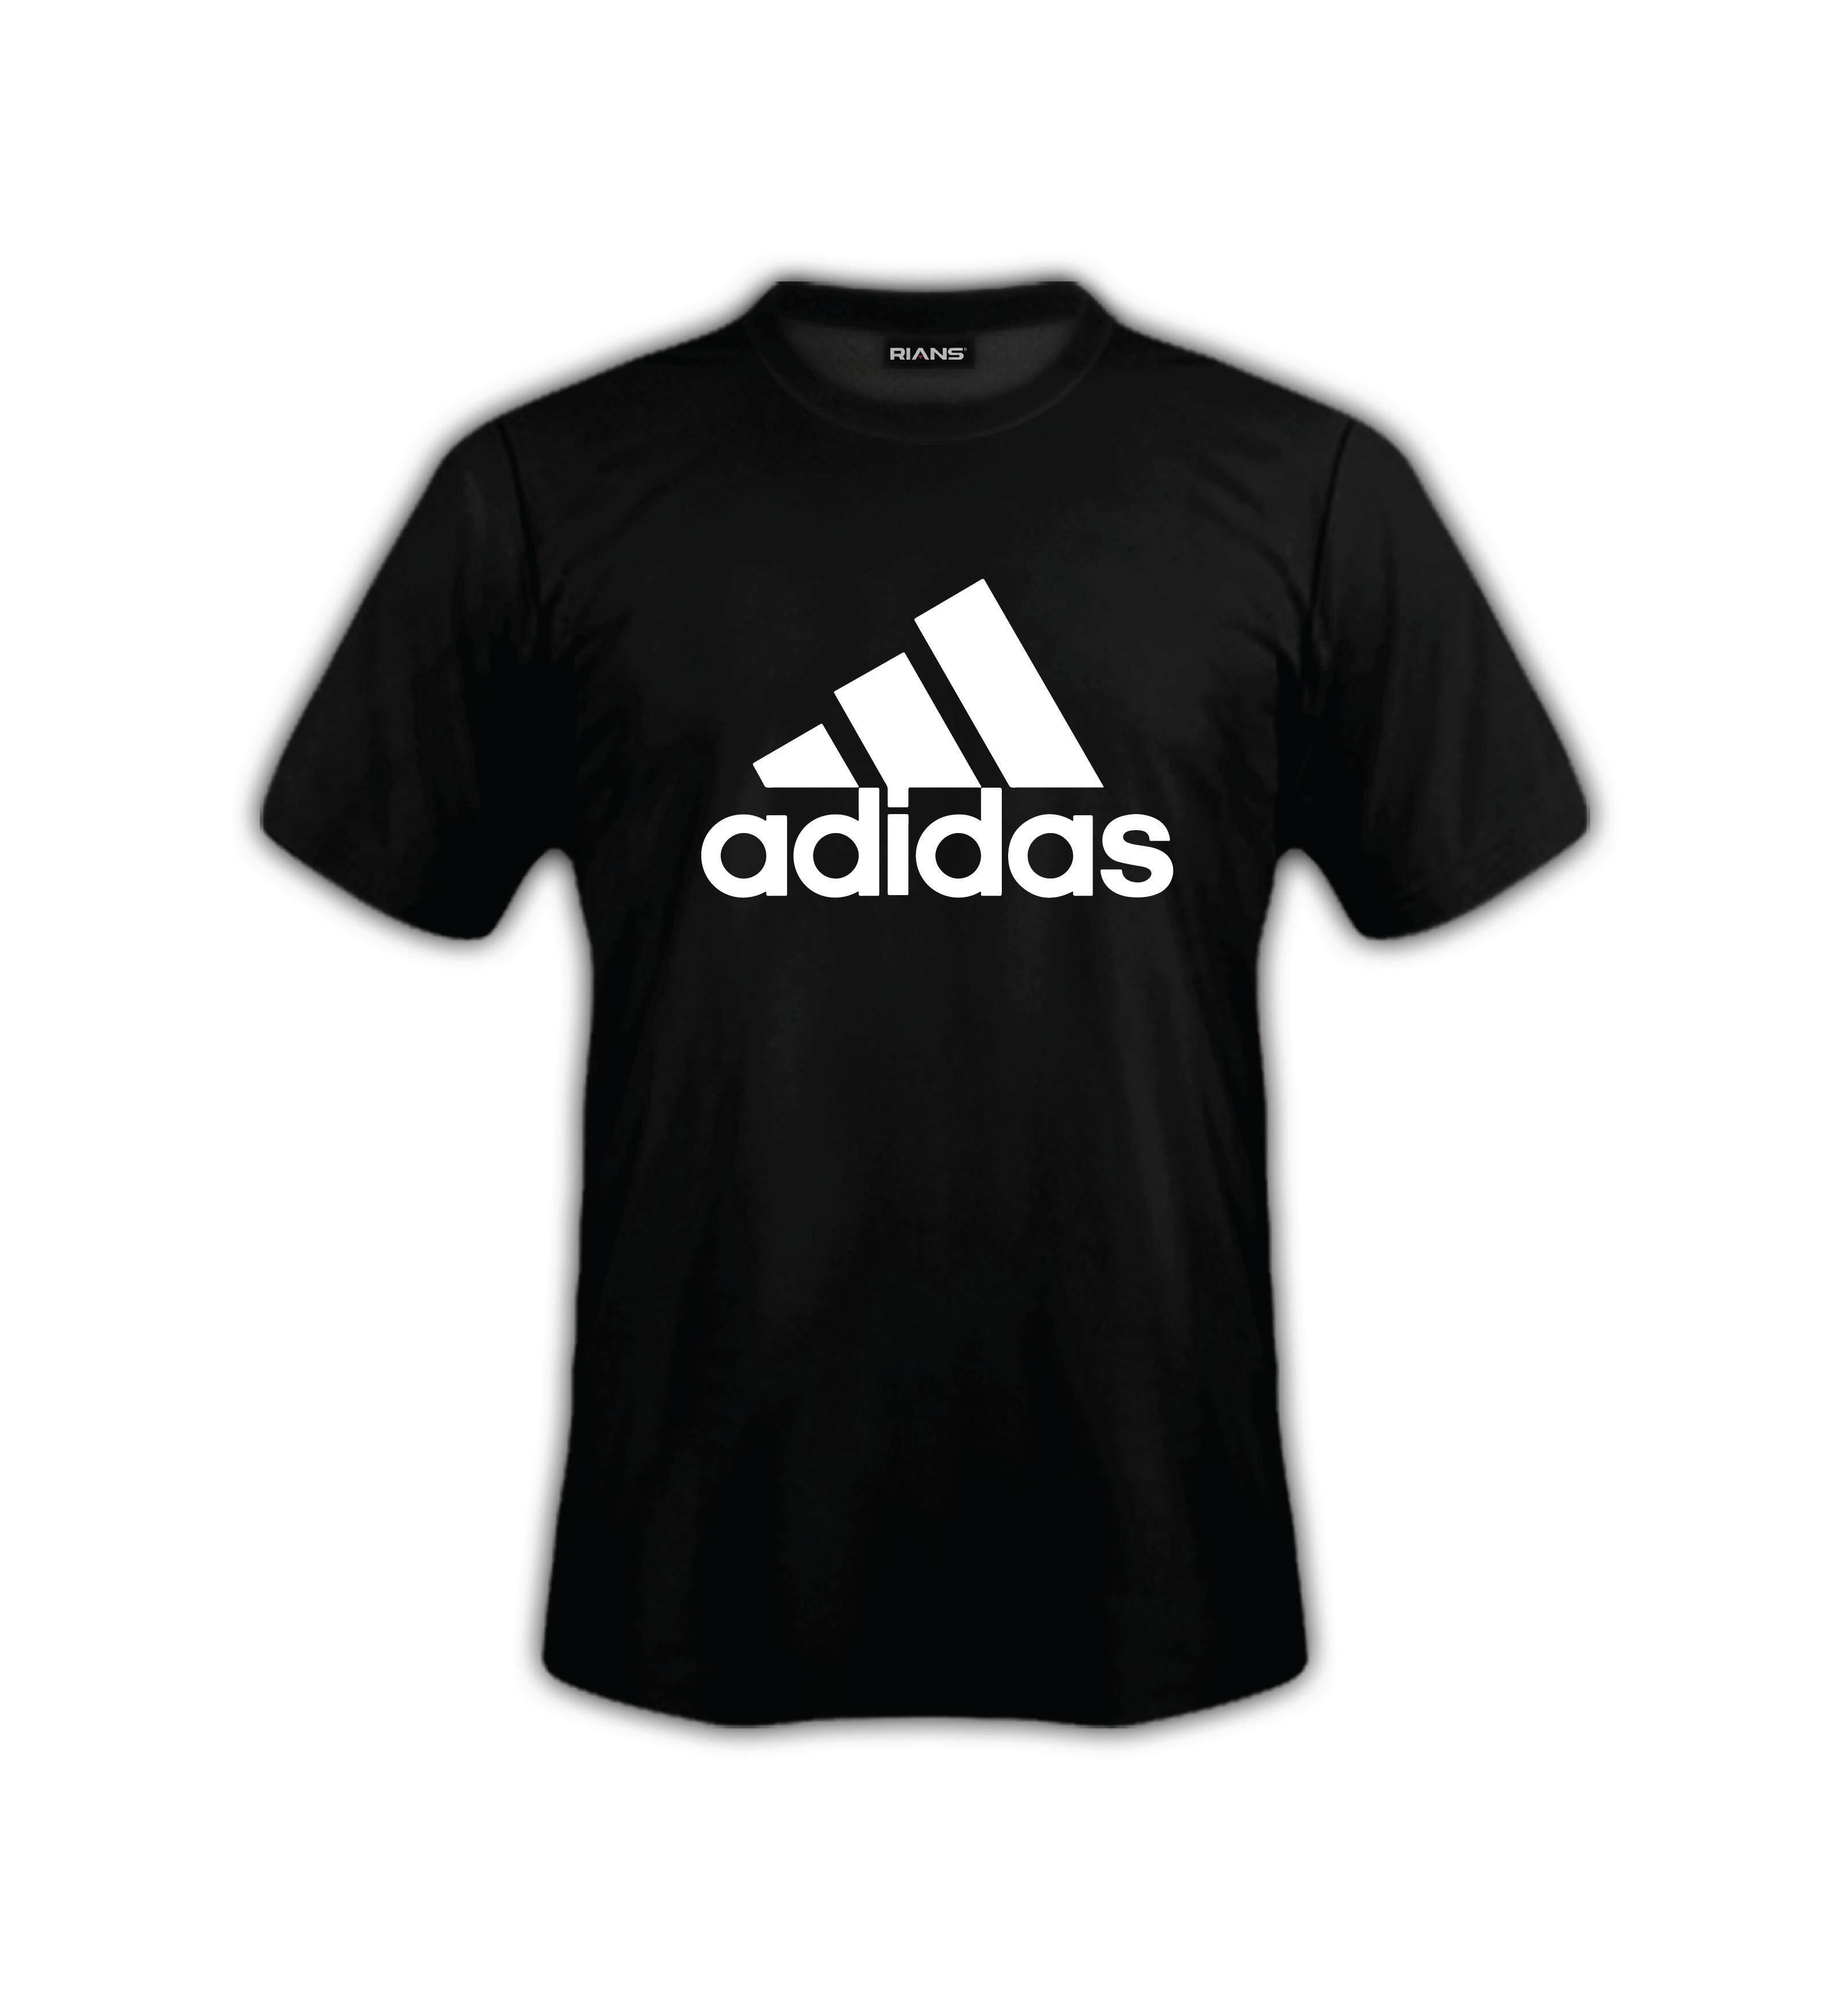 T-Shirt ADIDA.S FRONT Logo Strip 100% Cotton Baju Tshirt Black White Hitam Putih Bossku